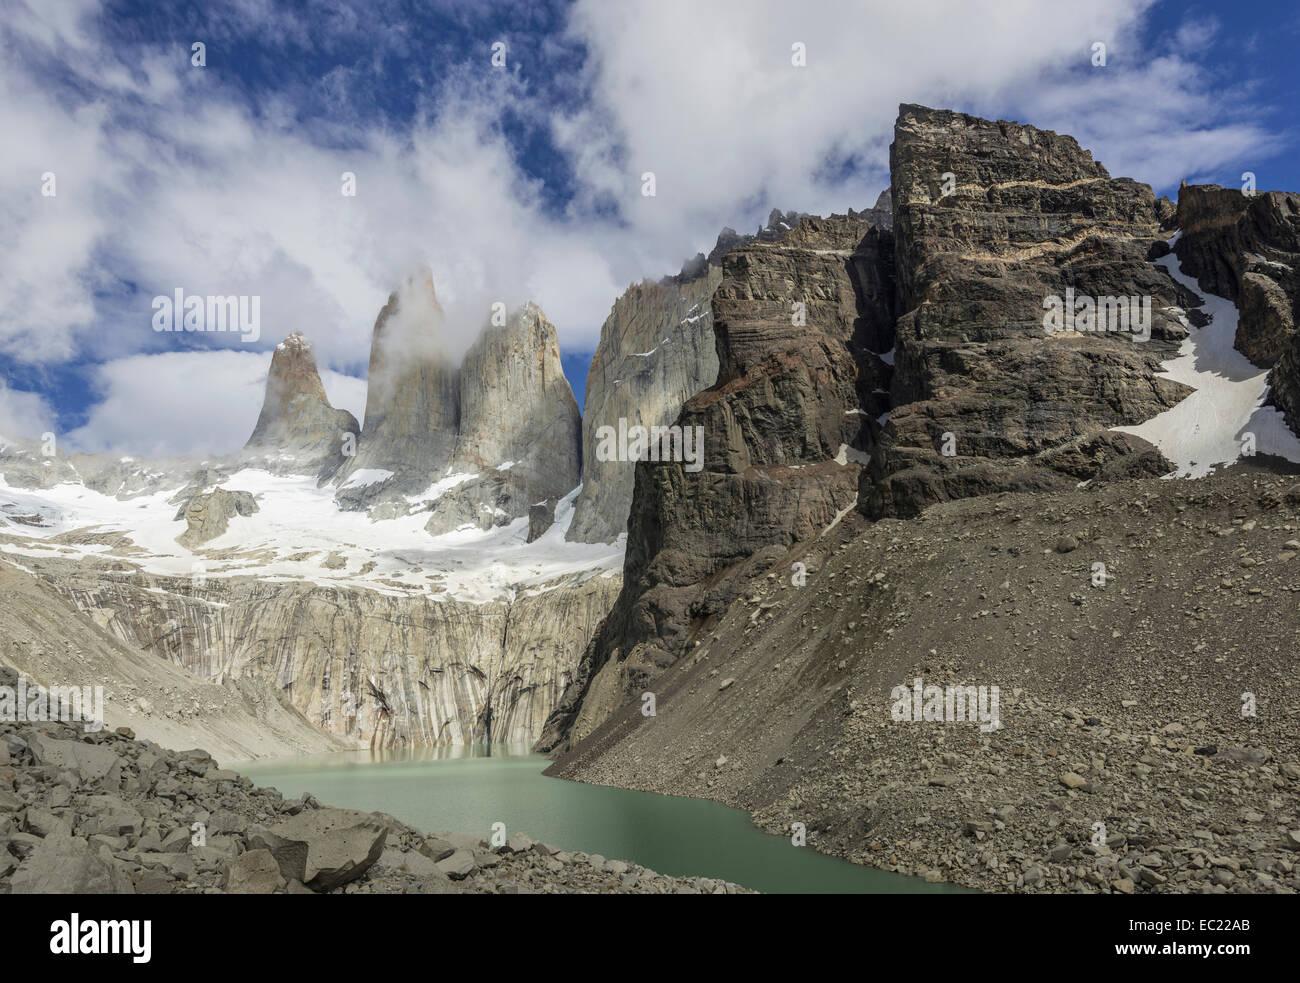 Torres del Paine, Torres del Paine National Park, Magallanes y la Antártica Chilena Region, Chile - Stock Image